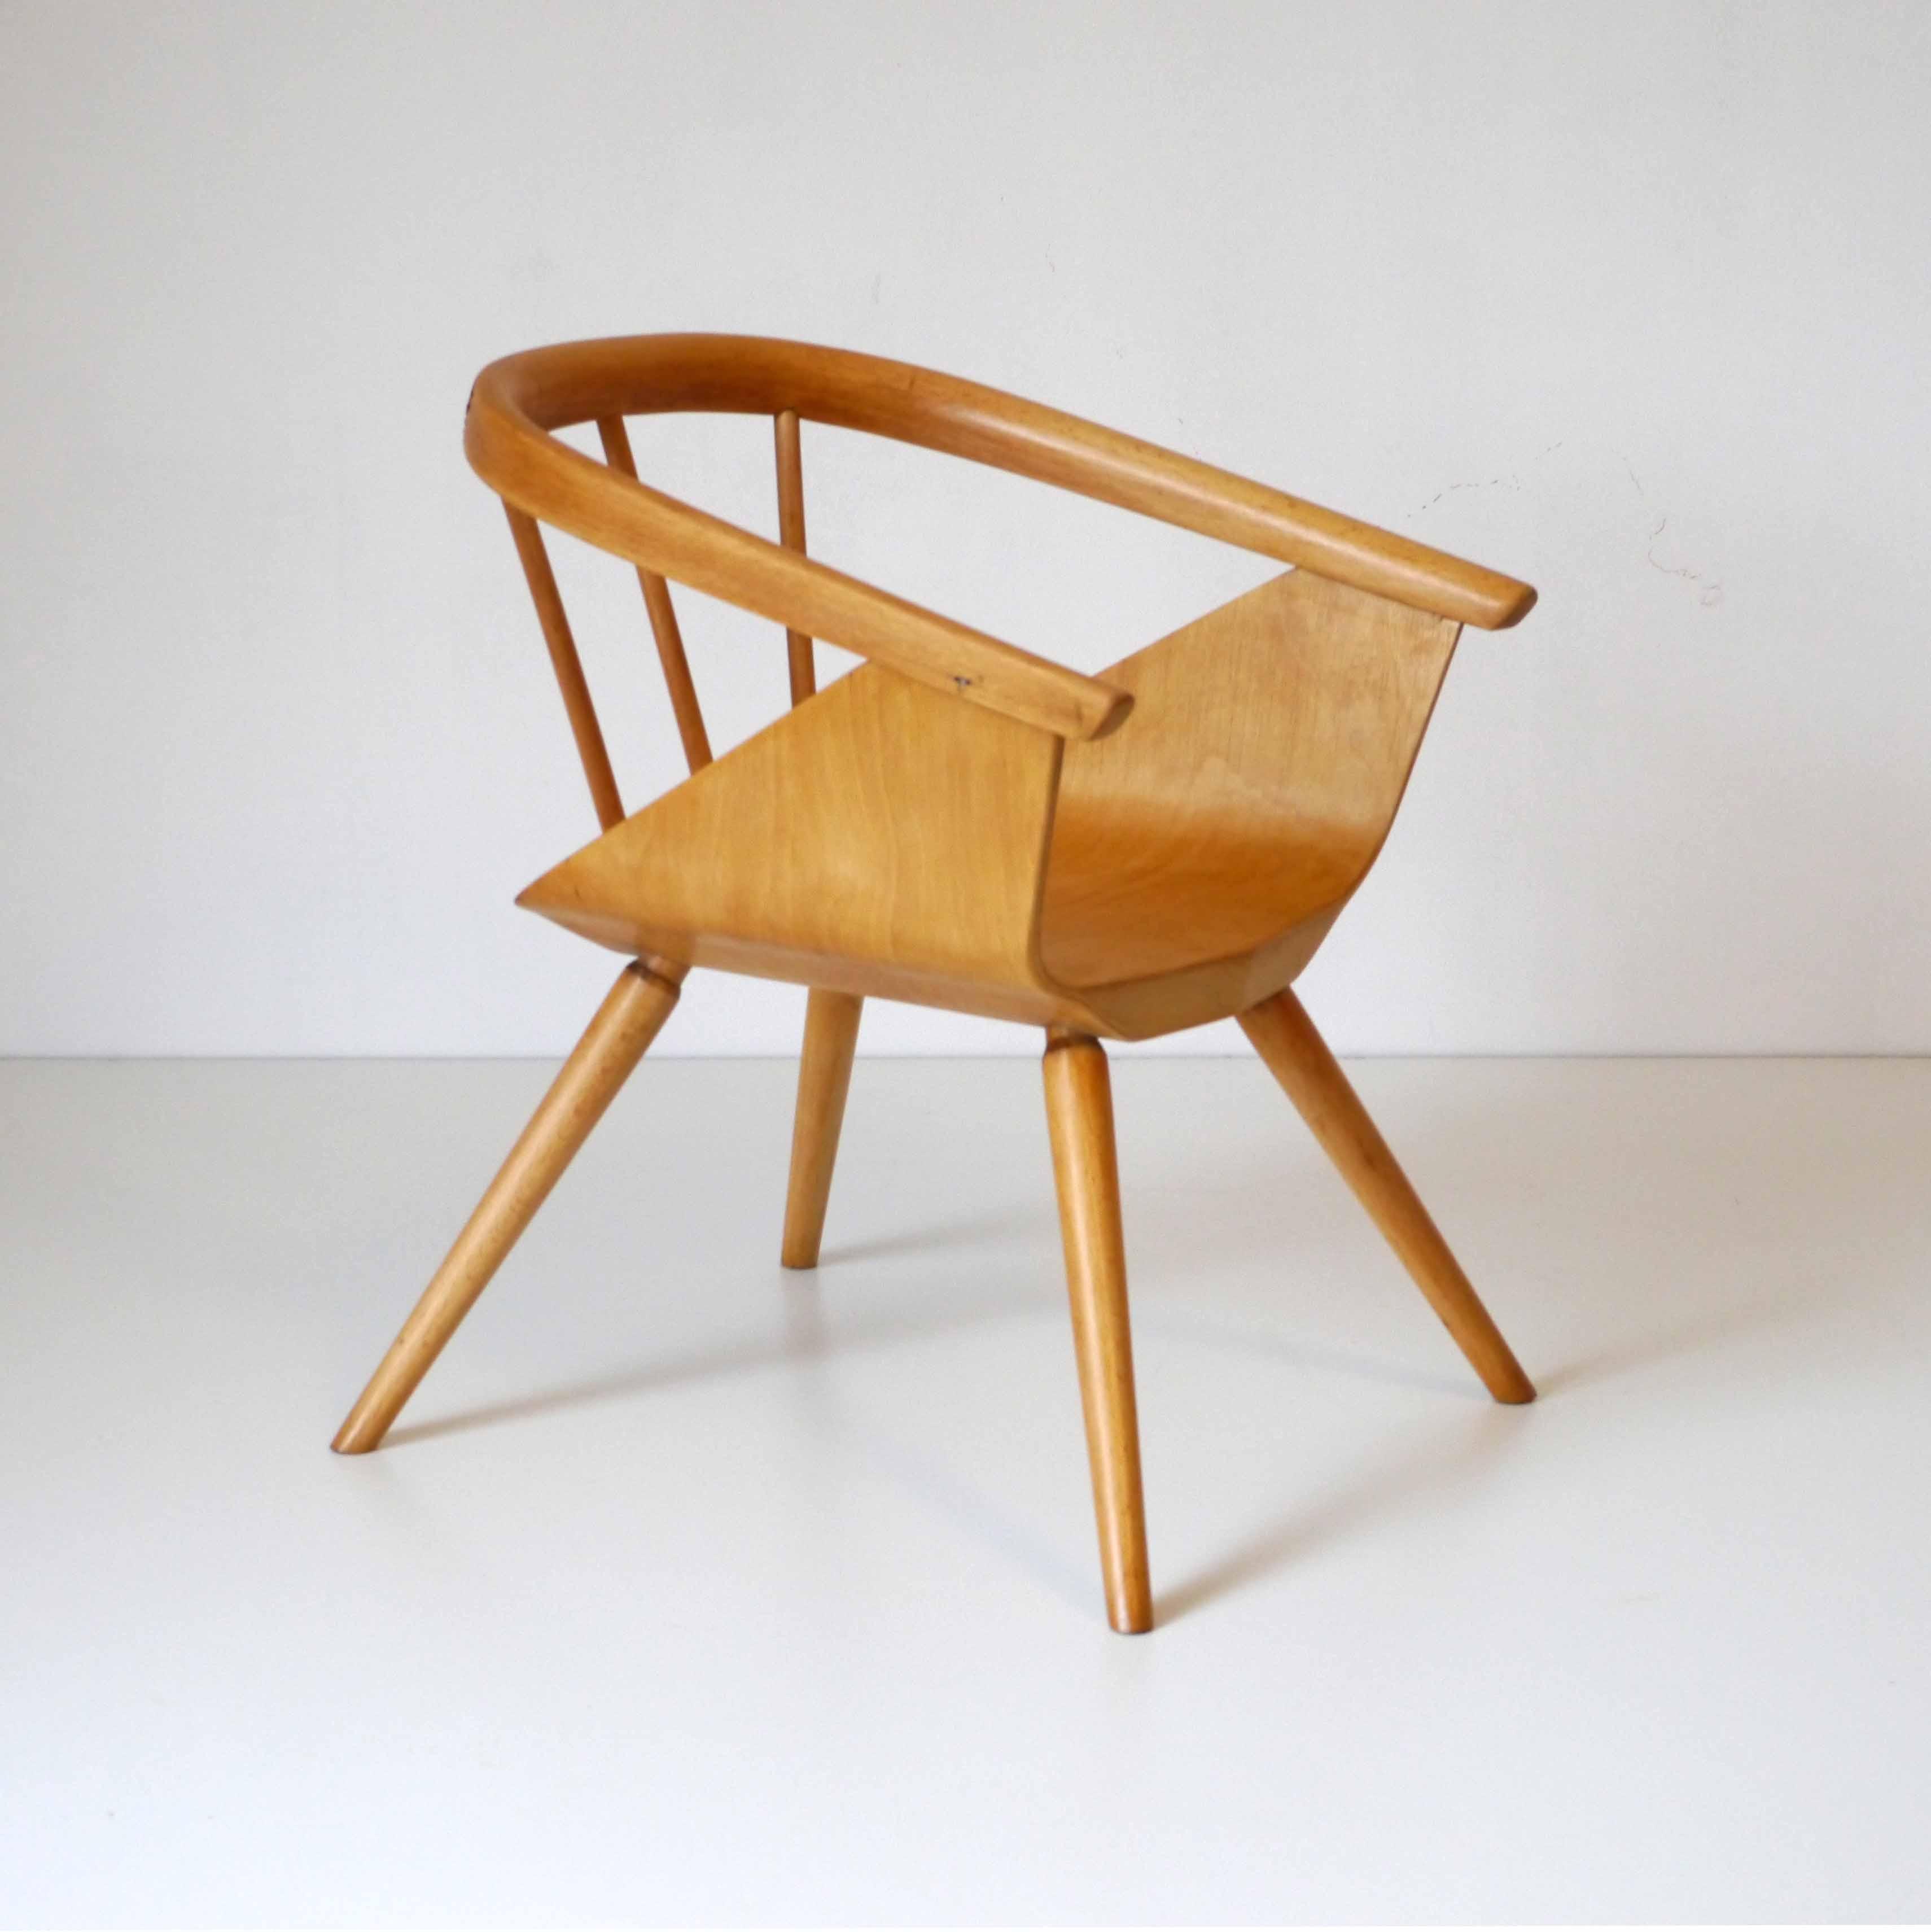 baumann fauteuil enfant design la marelle mobilier vintage enfants. Black Bedroom Furniture Sets. Home Design Ideas